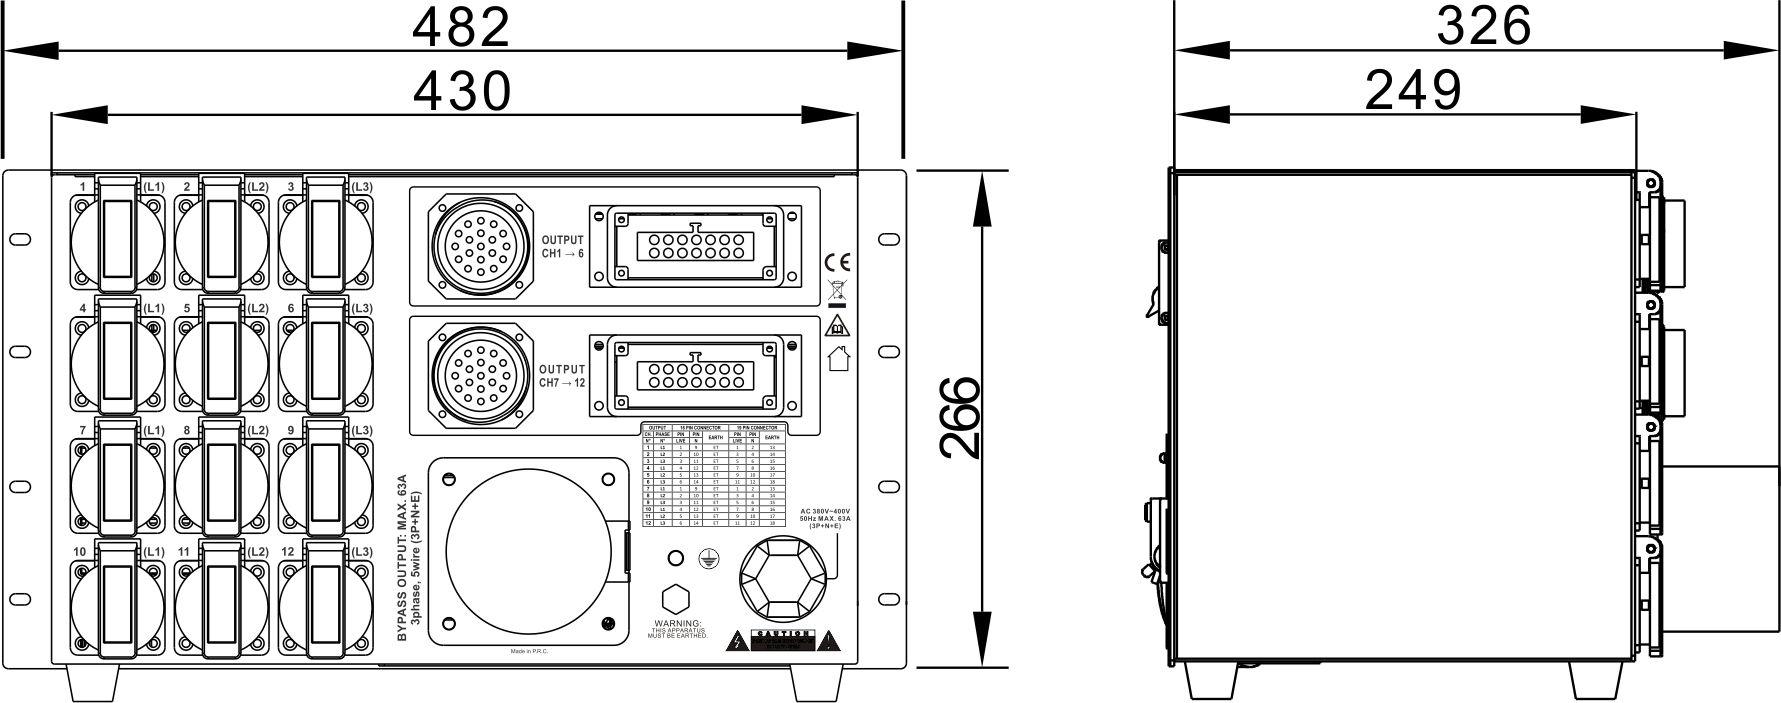 for ge oven wiring diagram jbp26gv3ad